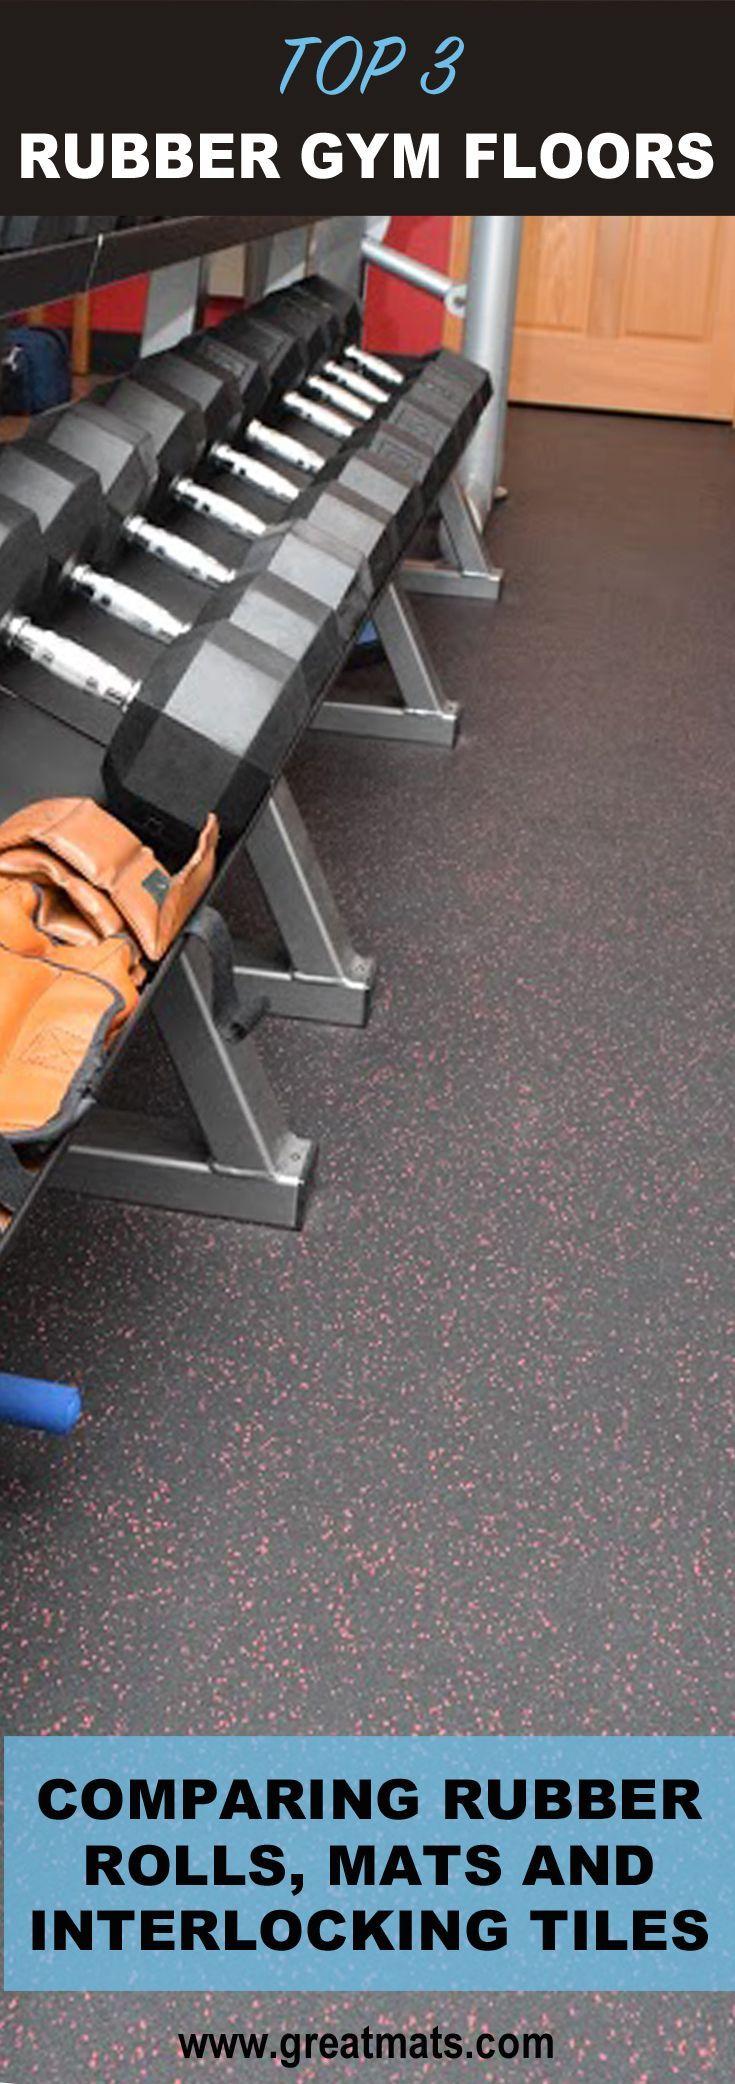 Best 25 interlocking rubber mats ideas on pinterest large rubber flooring rolls vs rubber stall mats vs interlocking rubber tiles for gym floors doublecrazyfo Choice Image